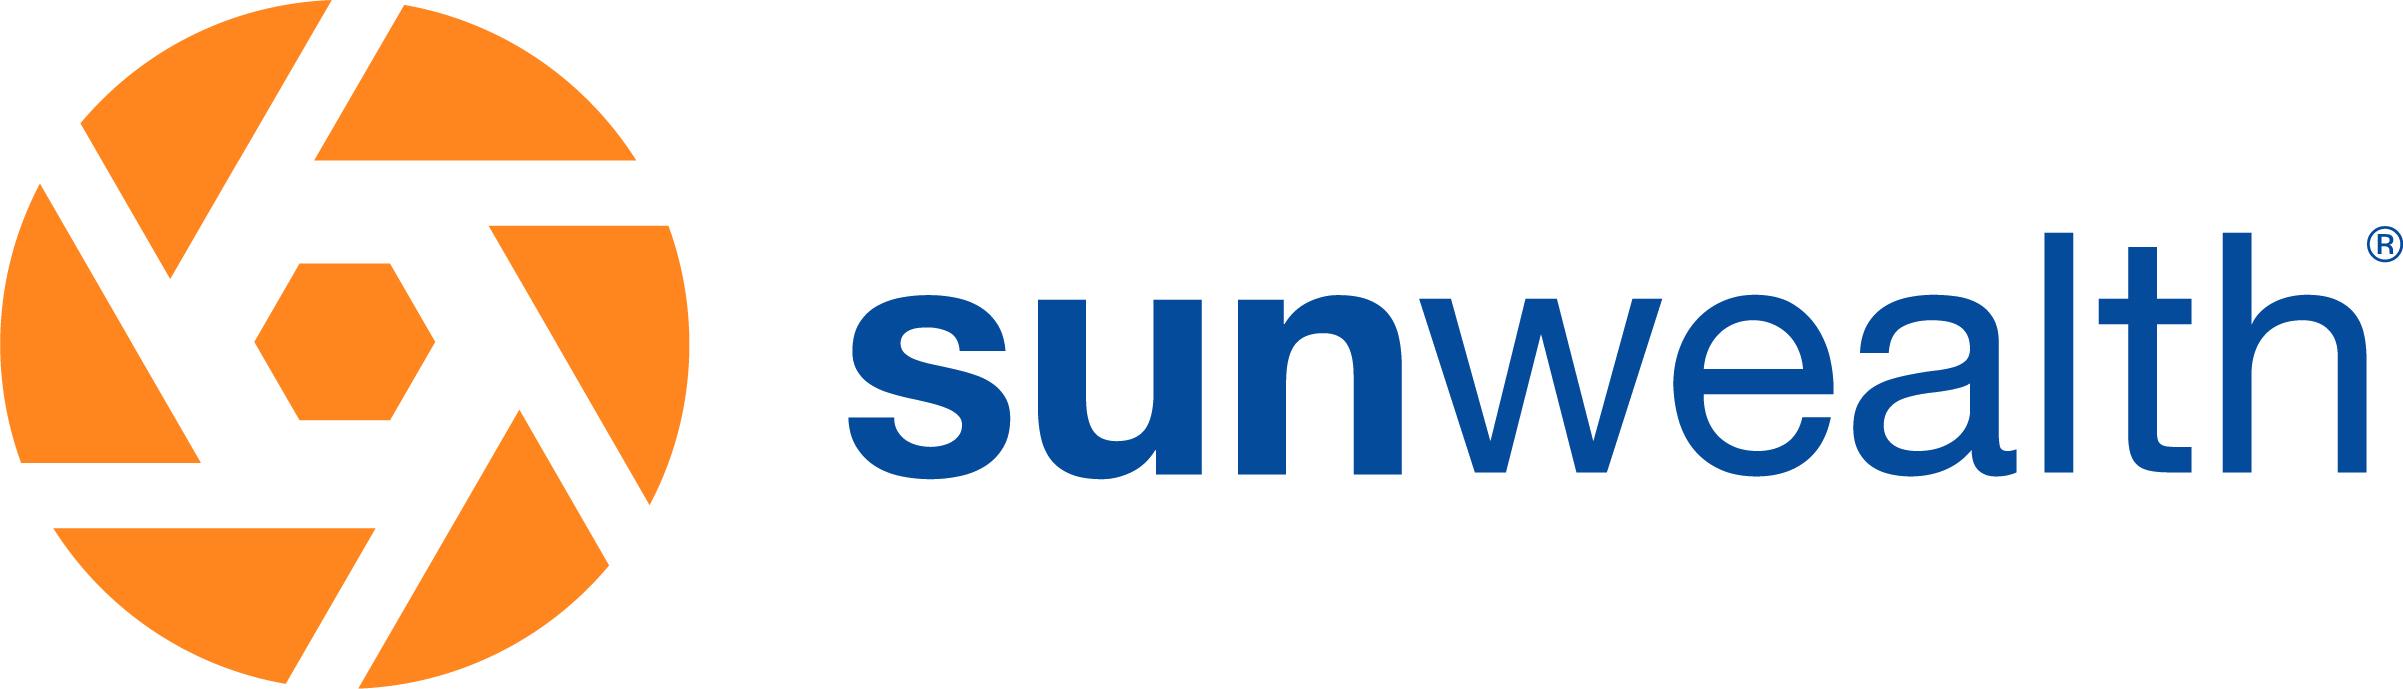 Sunwealth_2Color.jpg